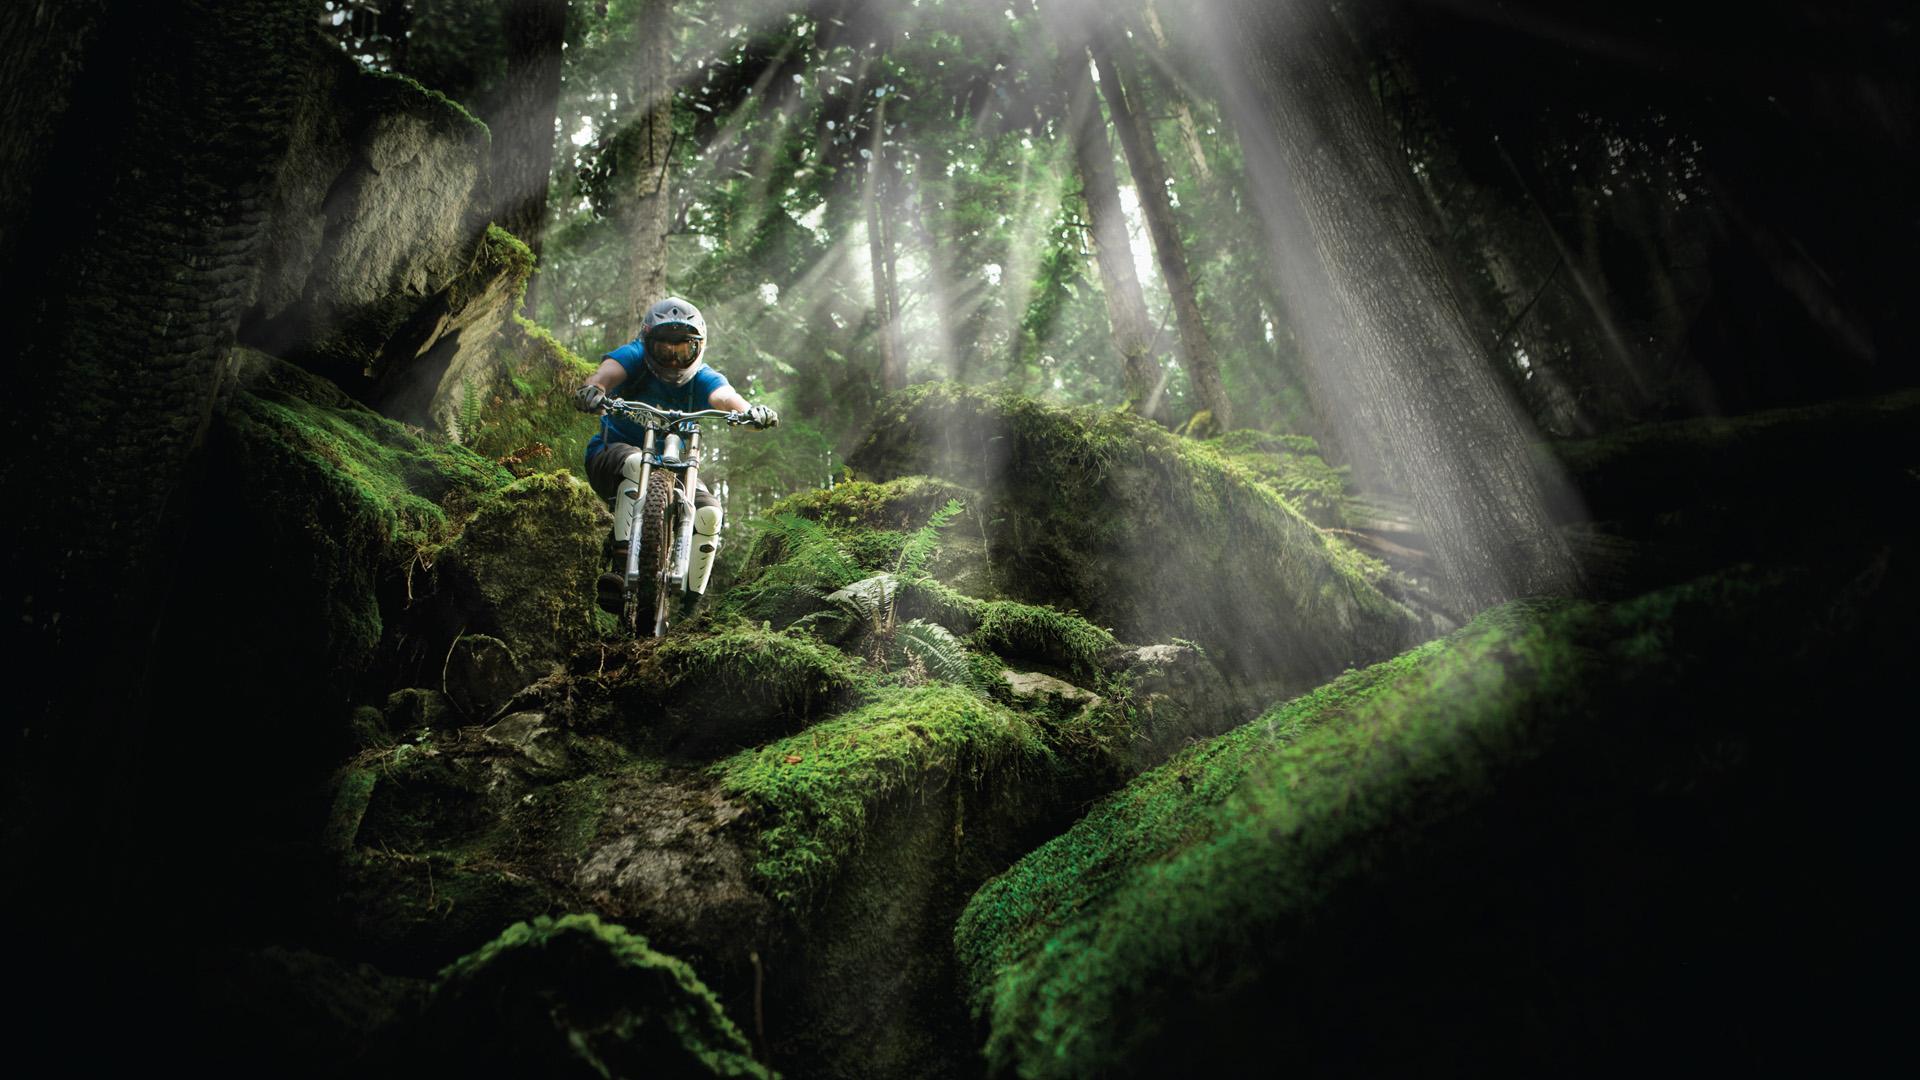 Mountain Bikes Shimano Wallpaper 1920x1080 65910 Wallpaperup